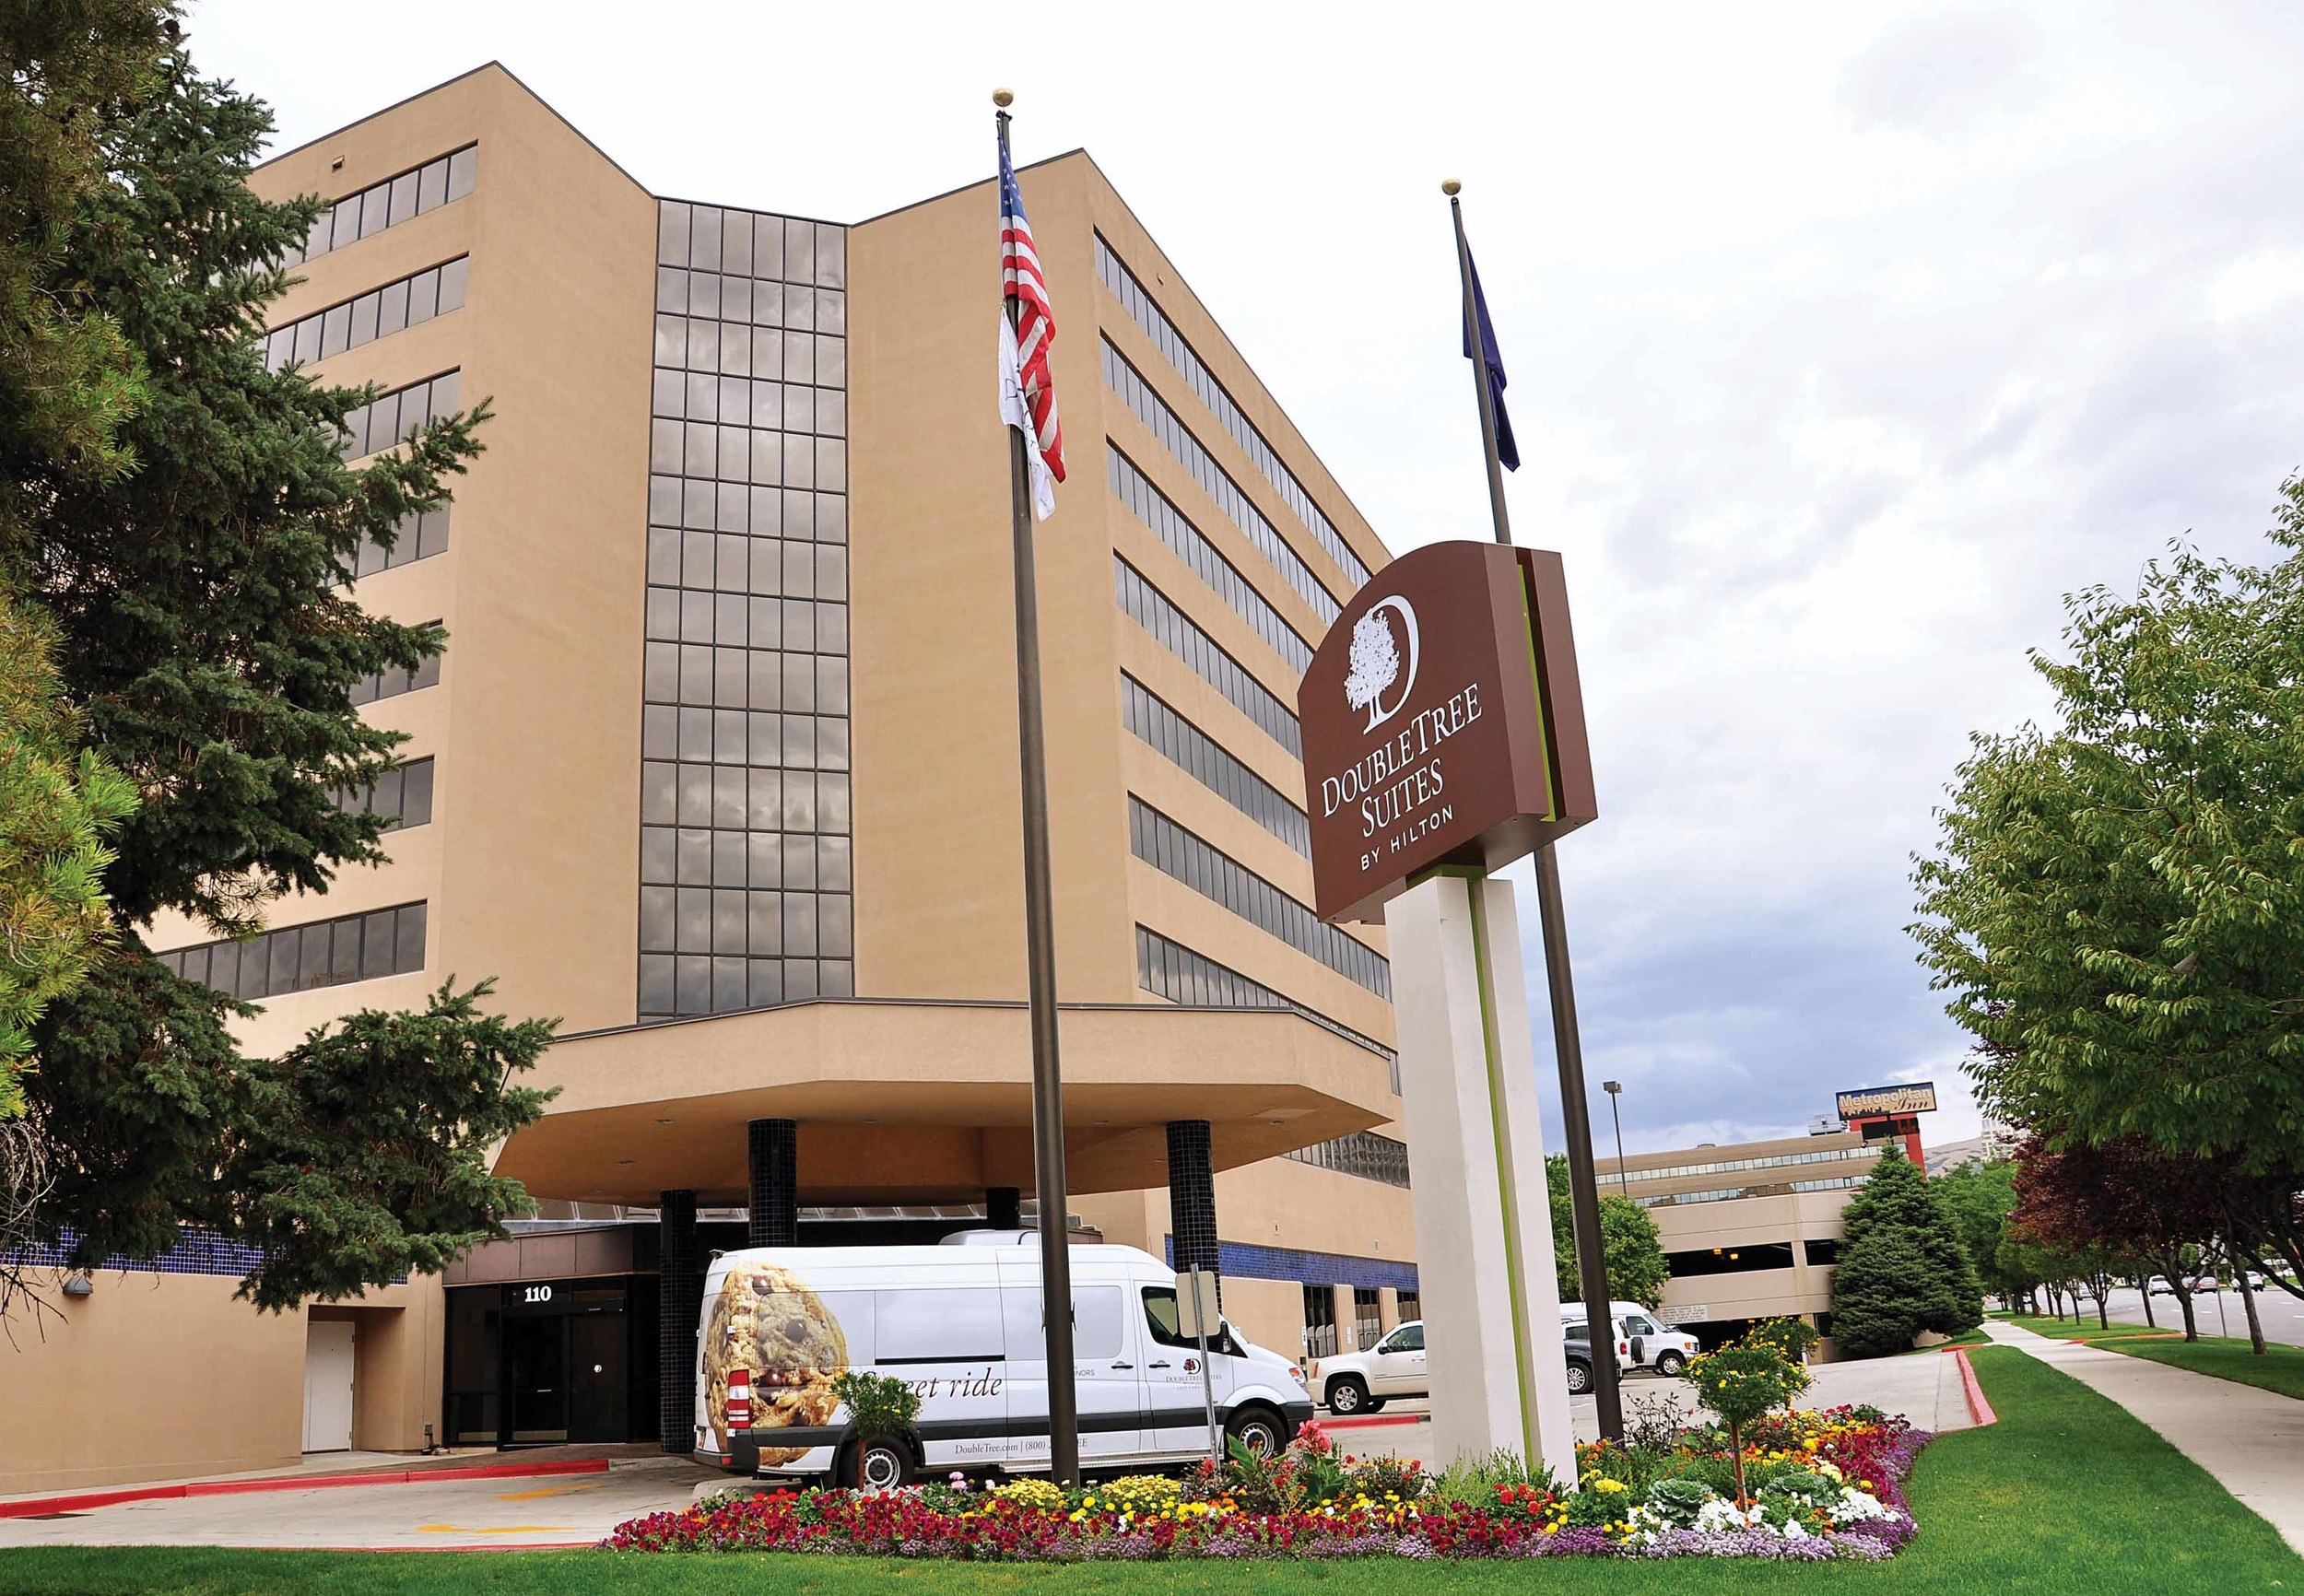 2/DoubleTree Suites by Hilton Salt Lake City Downtown